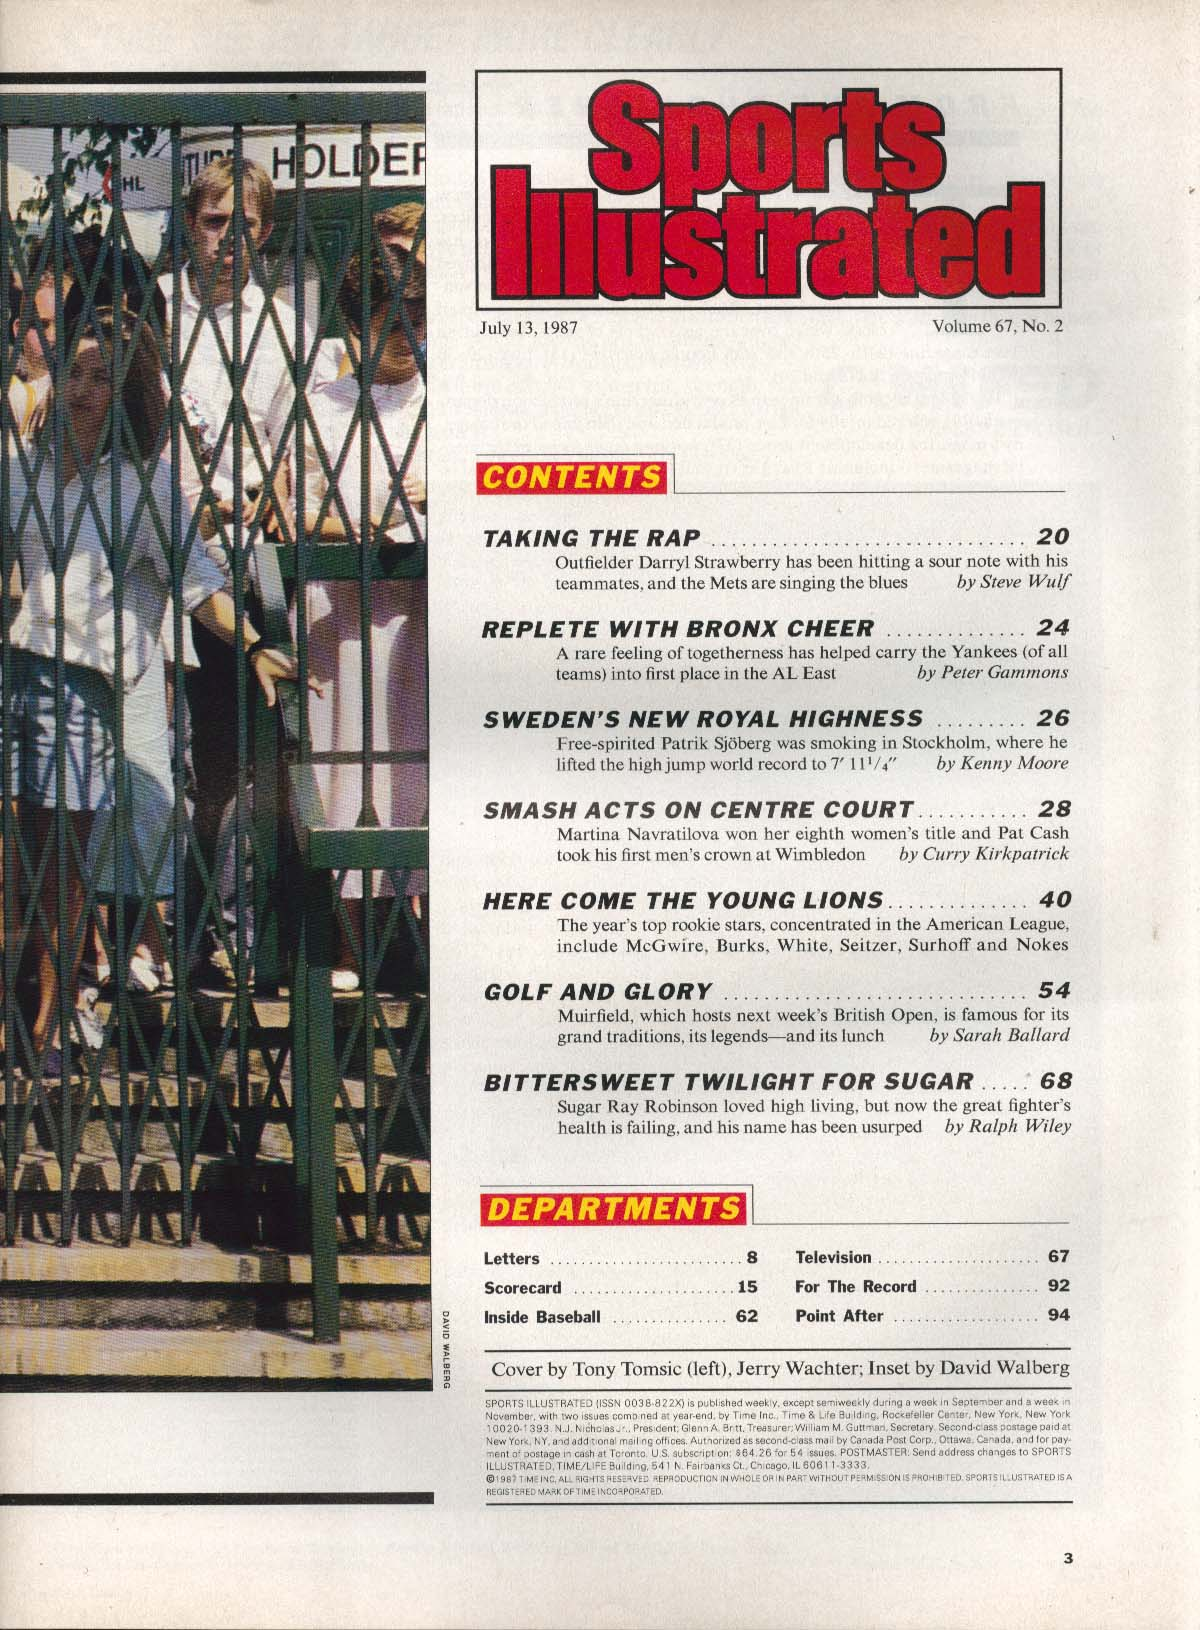 SPORTS ILLUSTRATED Darryl Strawberry Don Mattingly Martina Navratilova 7/13 1997